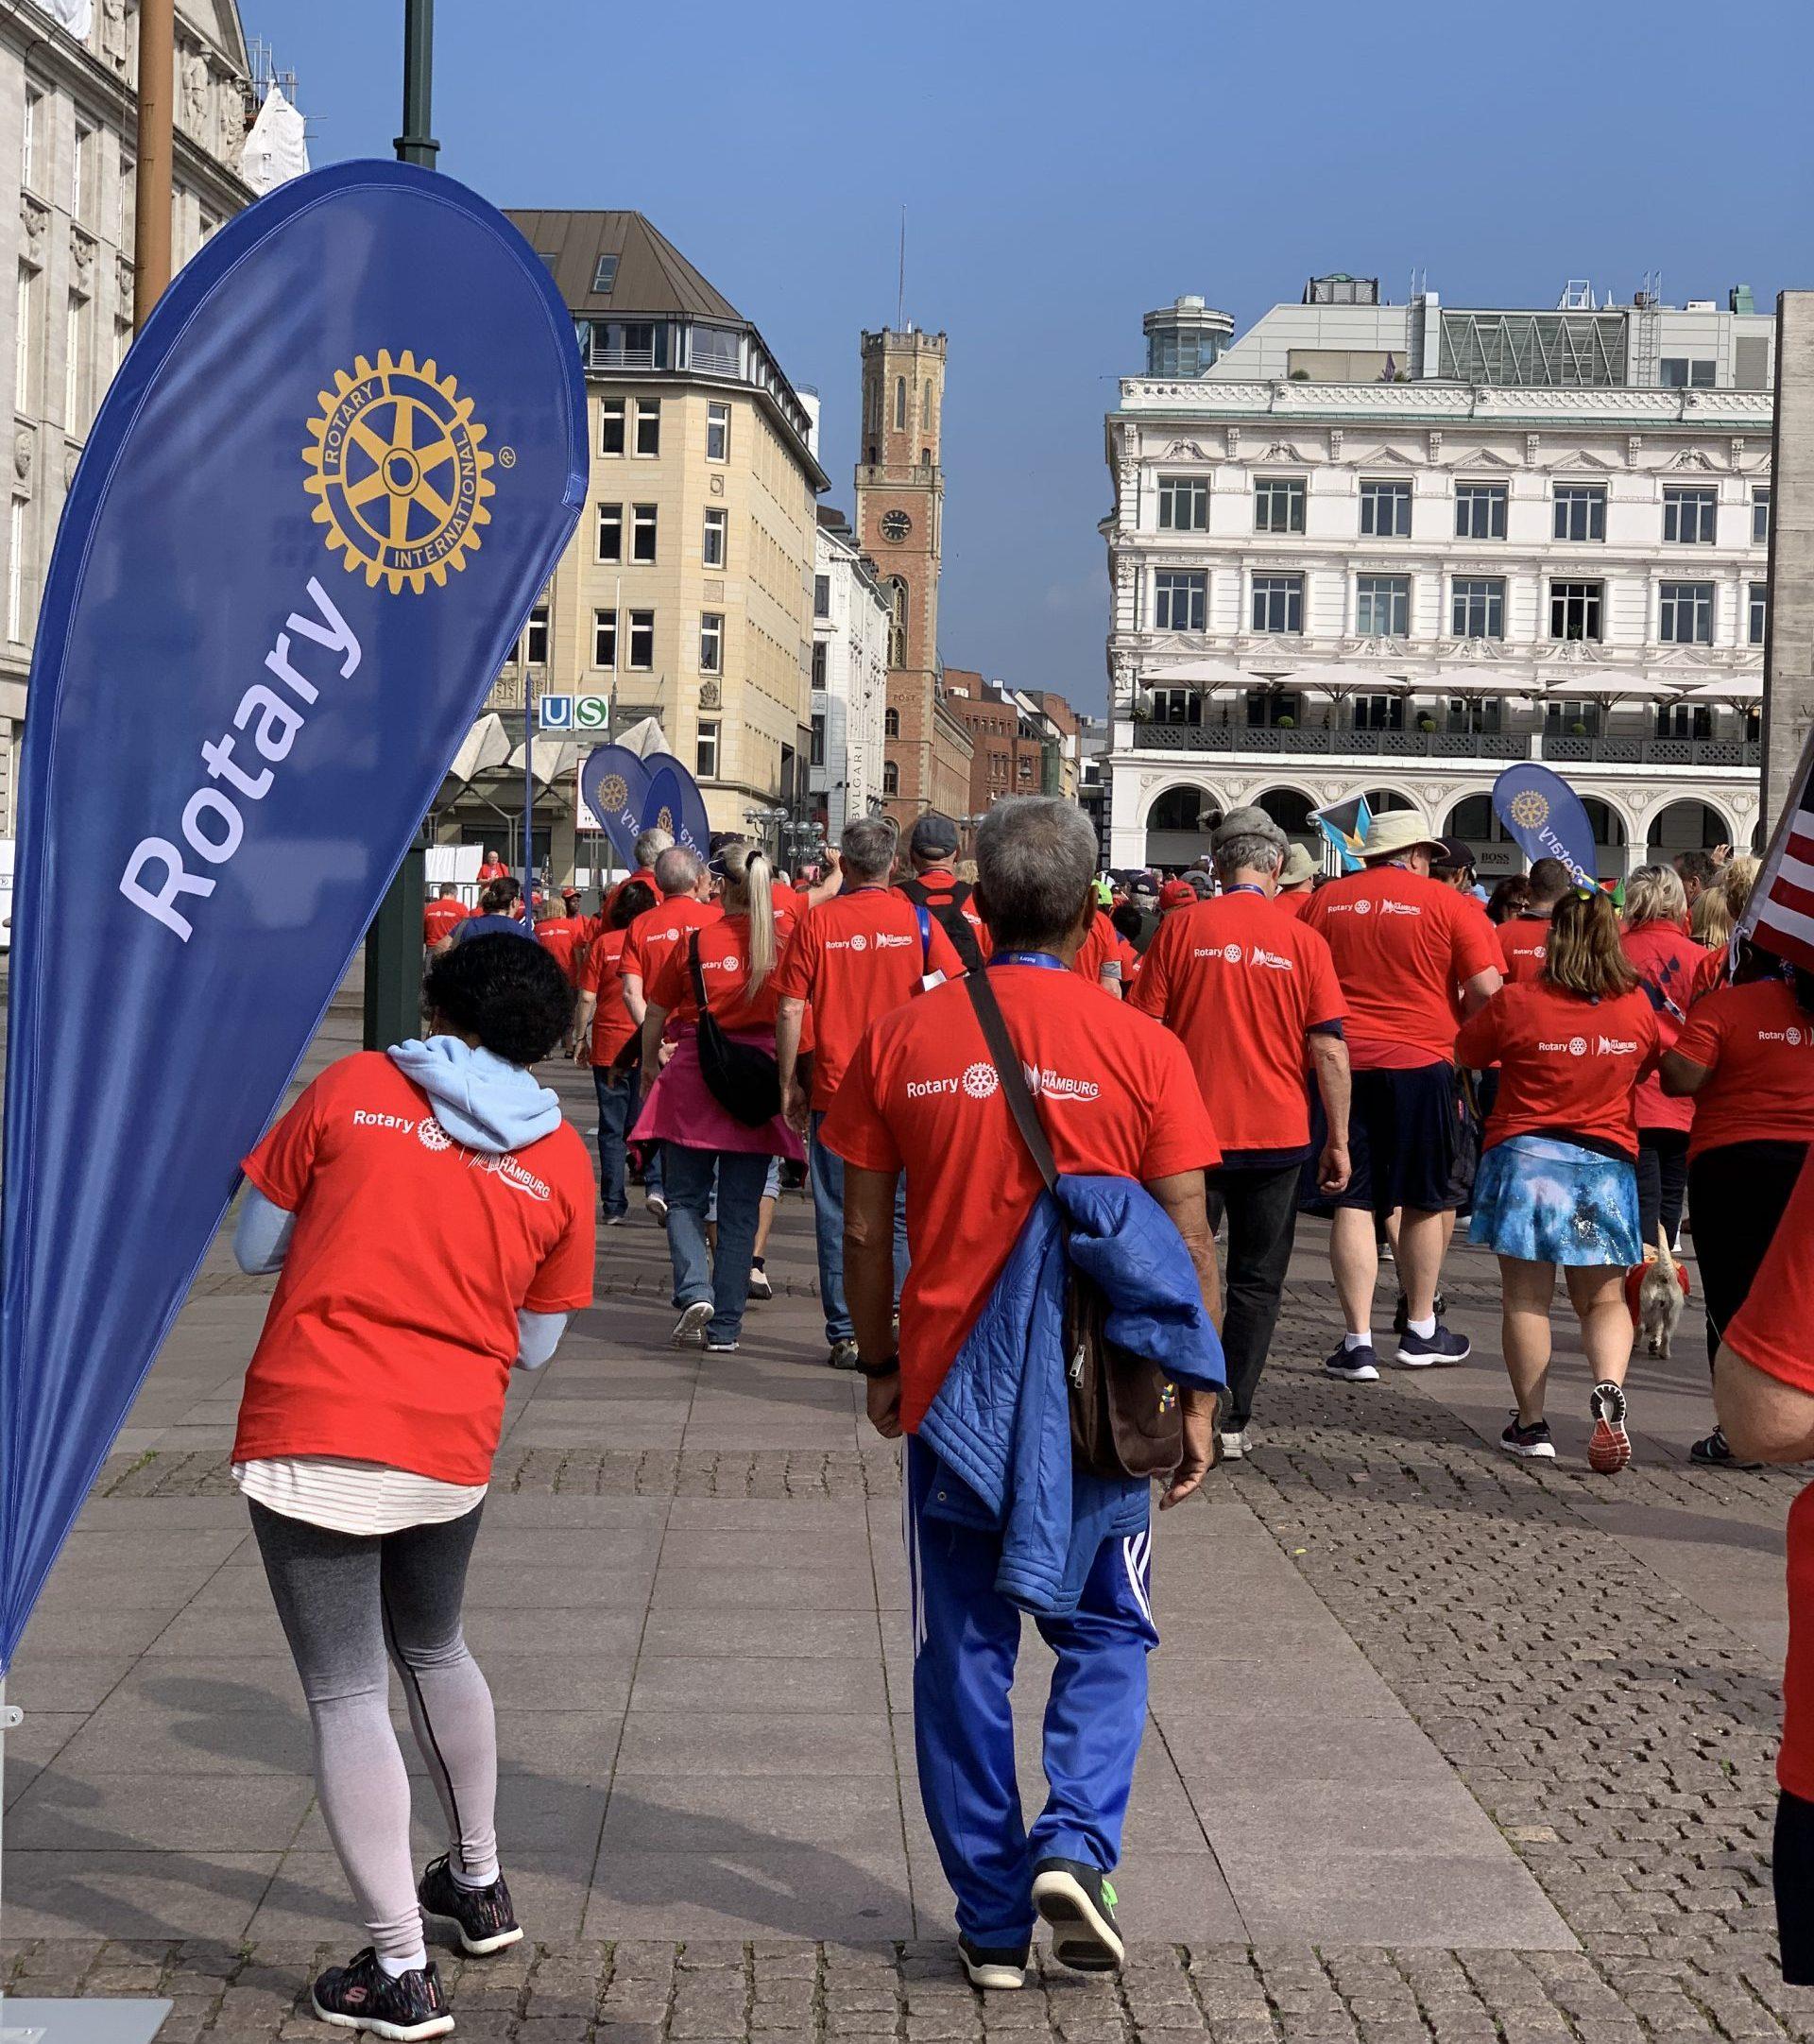 5k walk in Hamburg, Germany for Polio Awareness